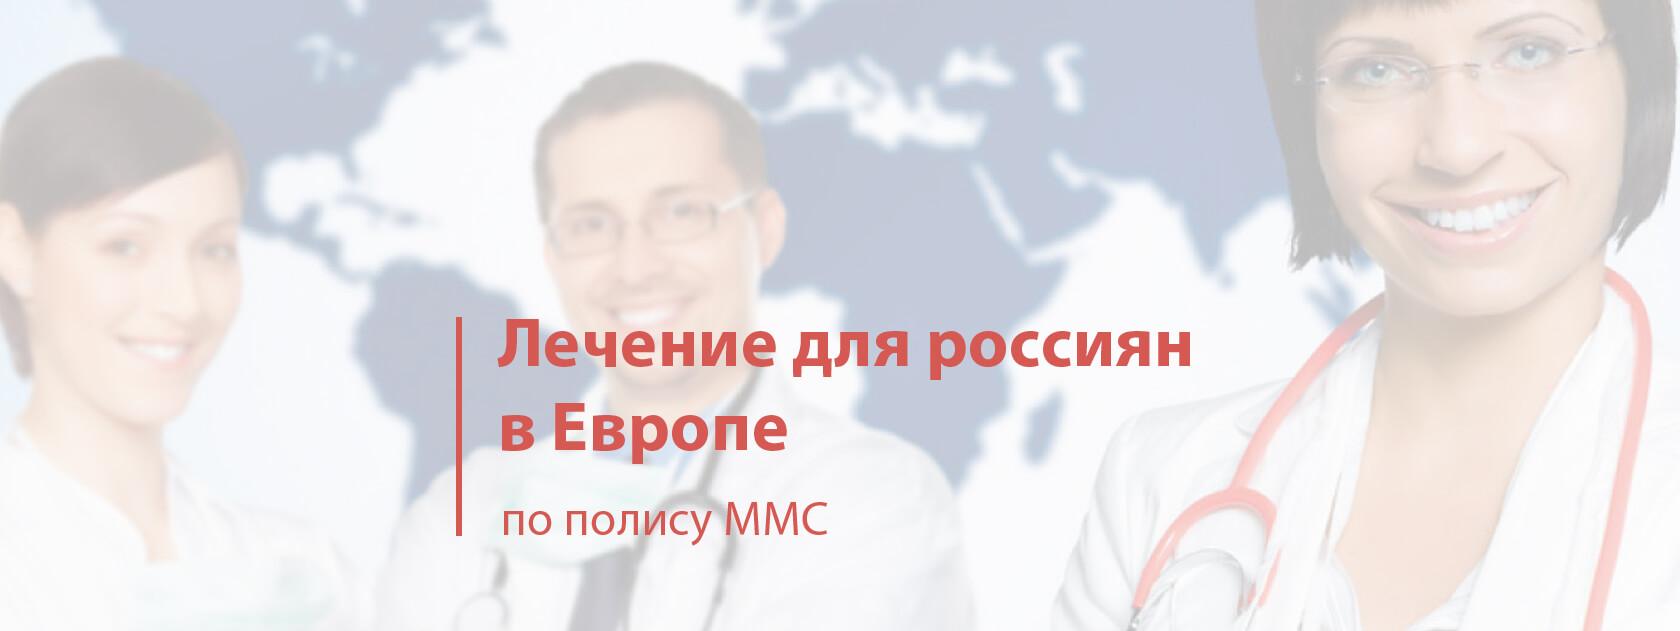 Лечение в Европе по полису ММС